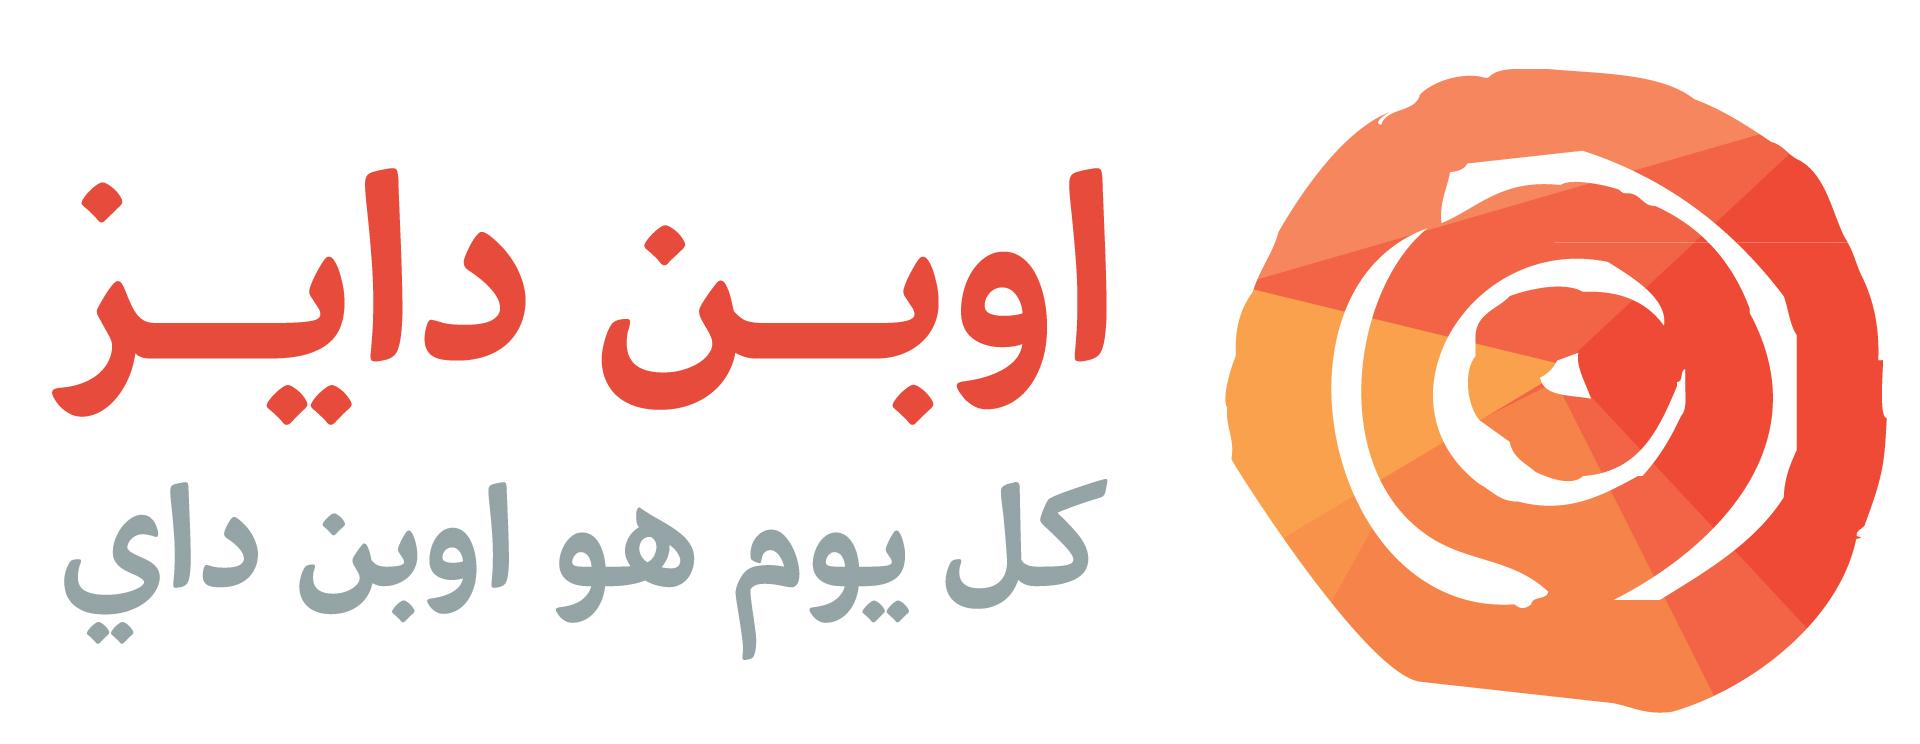 OpenDayz logo